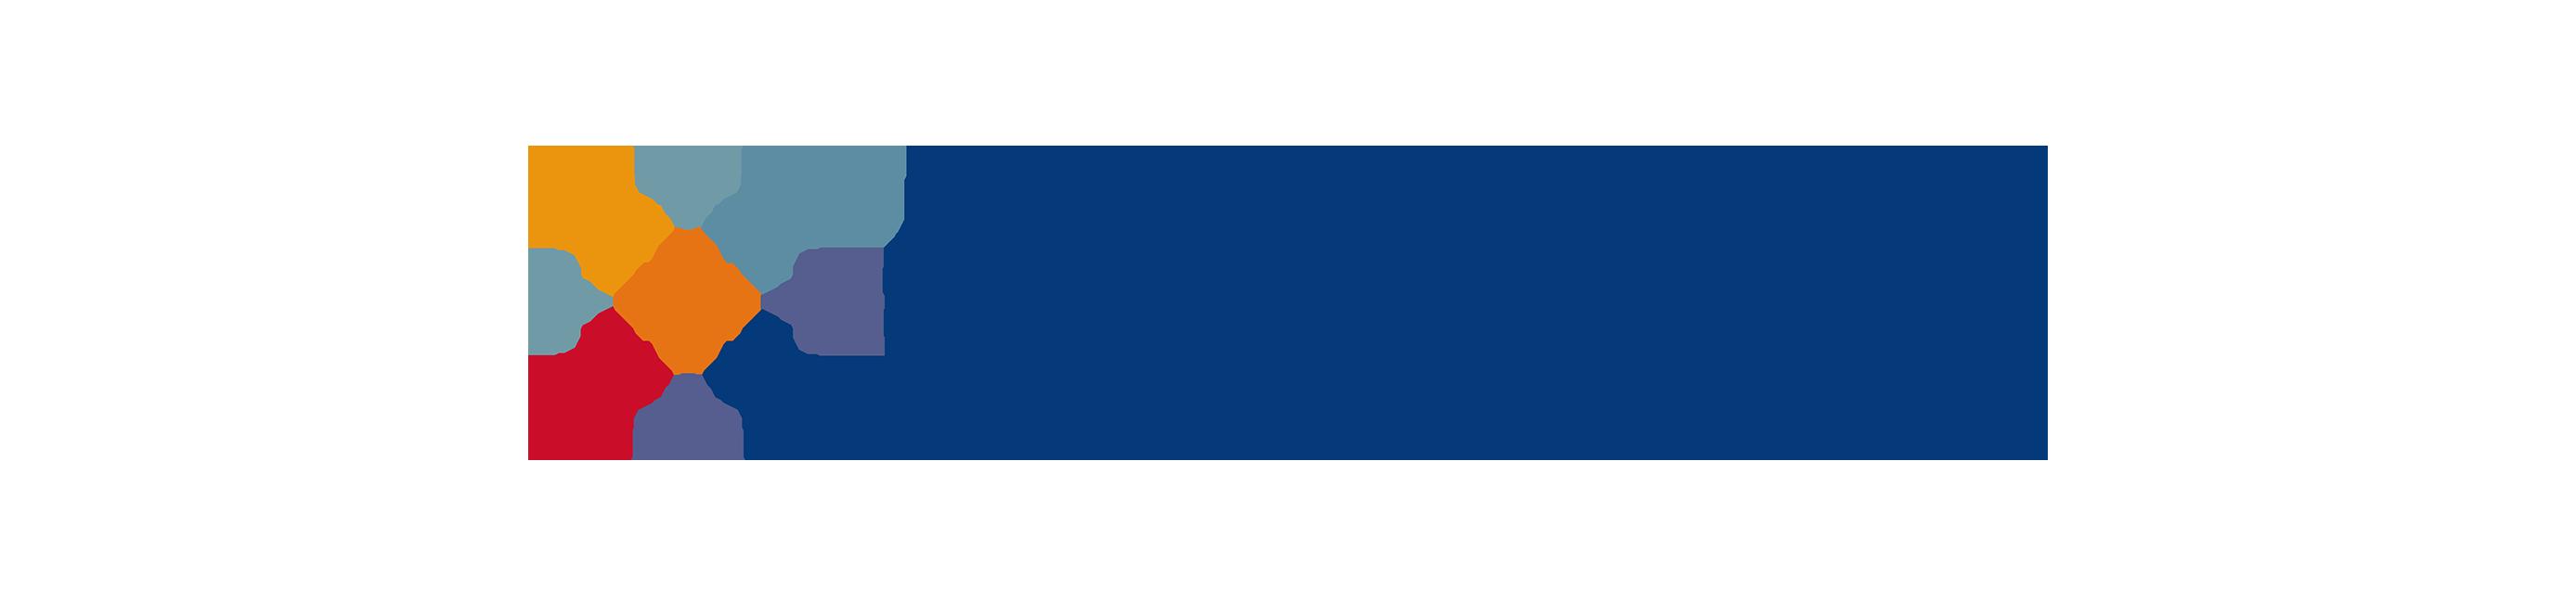 Tableau Server On Aws Quick Start